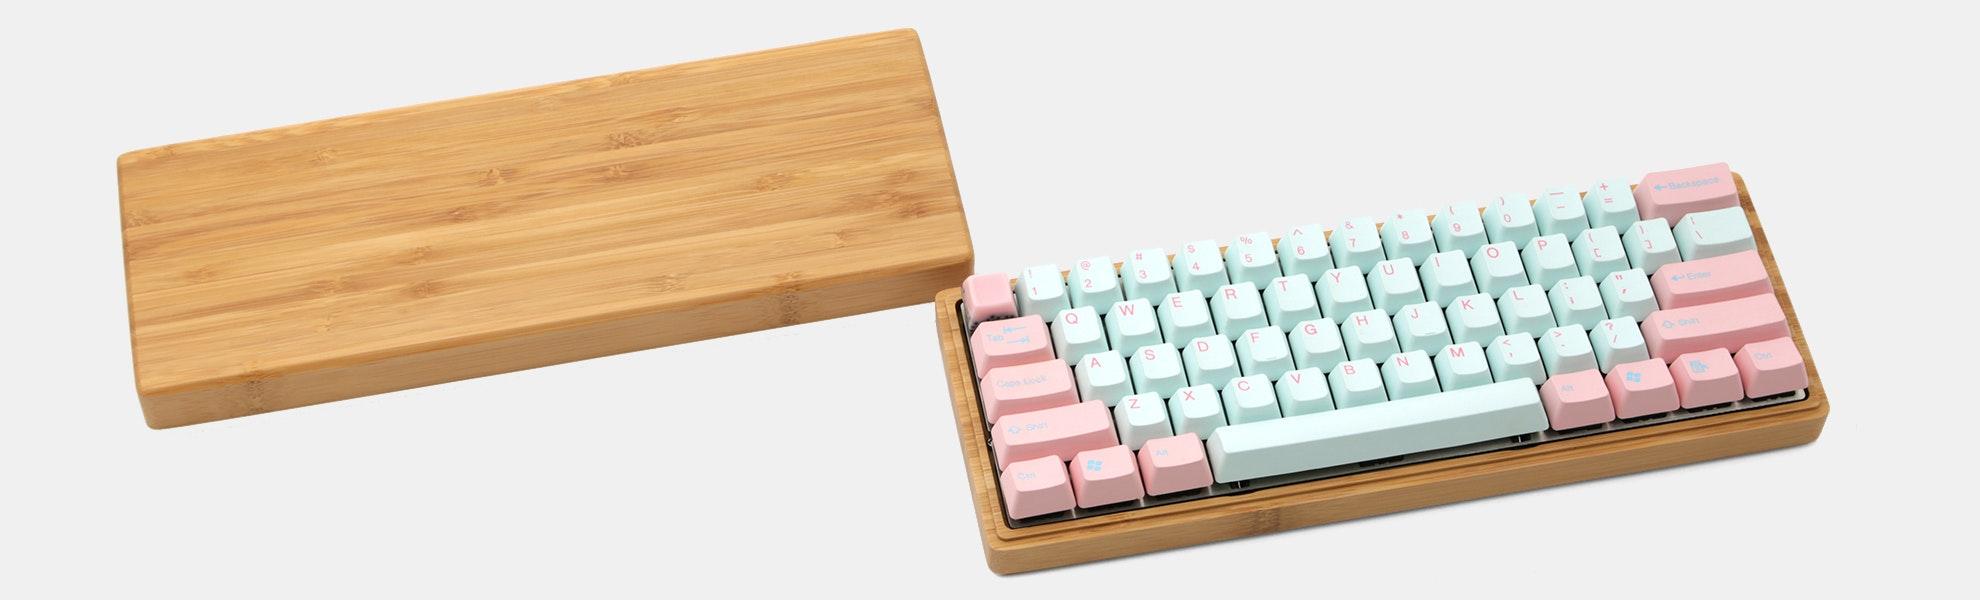 NPKC Bamboo 60% Mechanical Keyboard Case